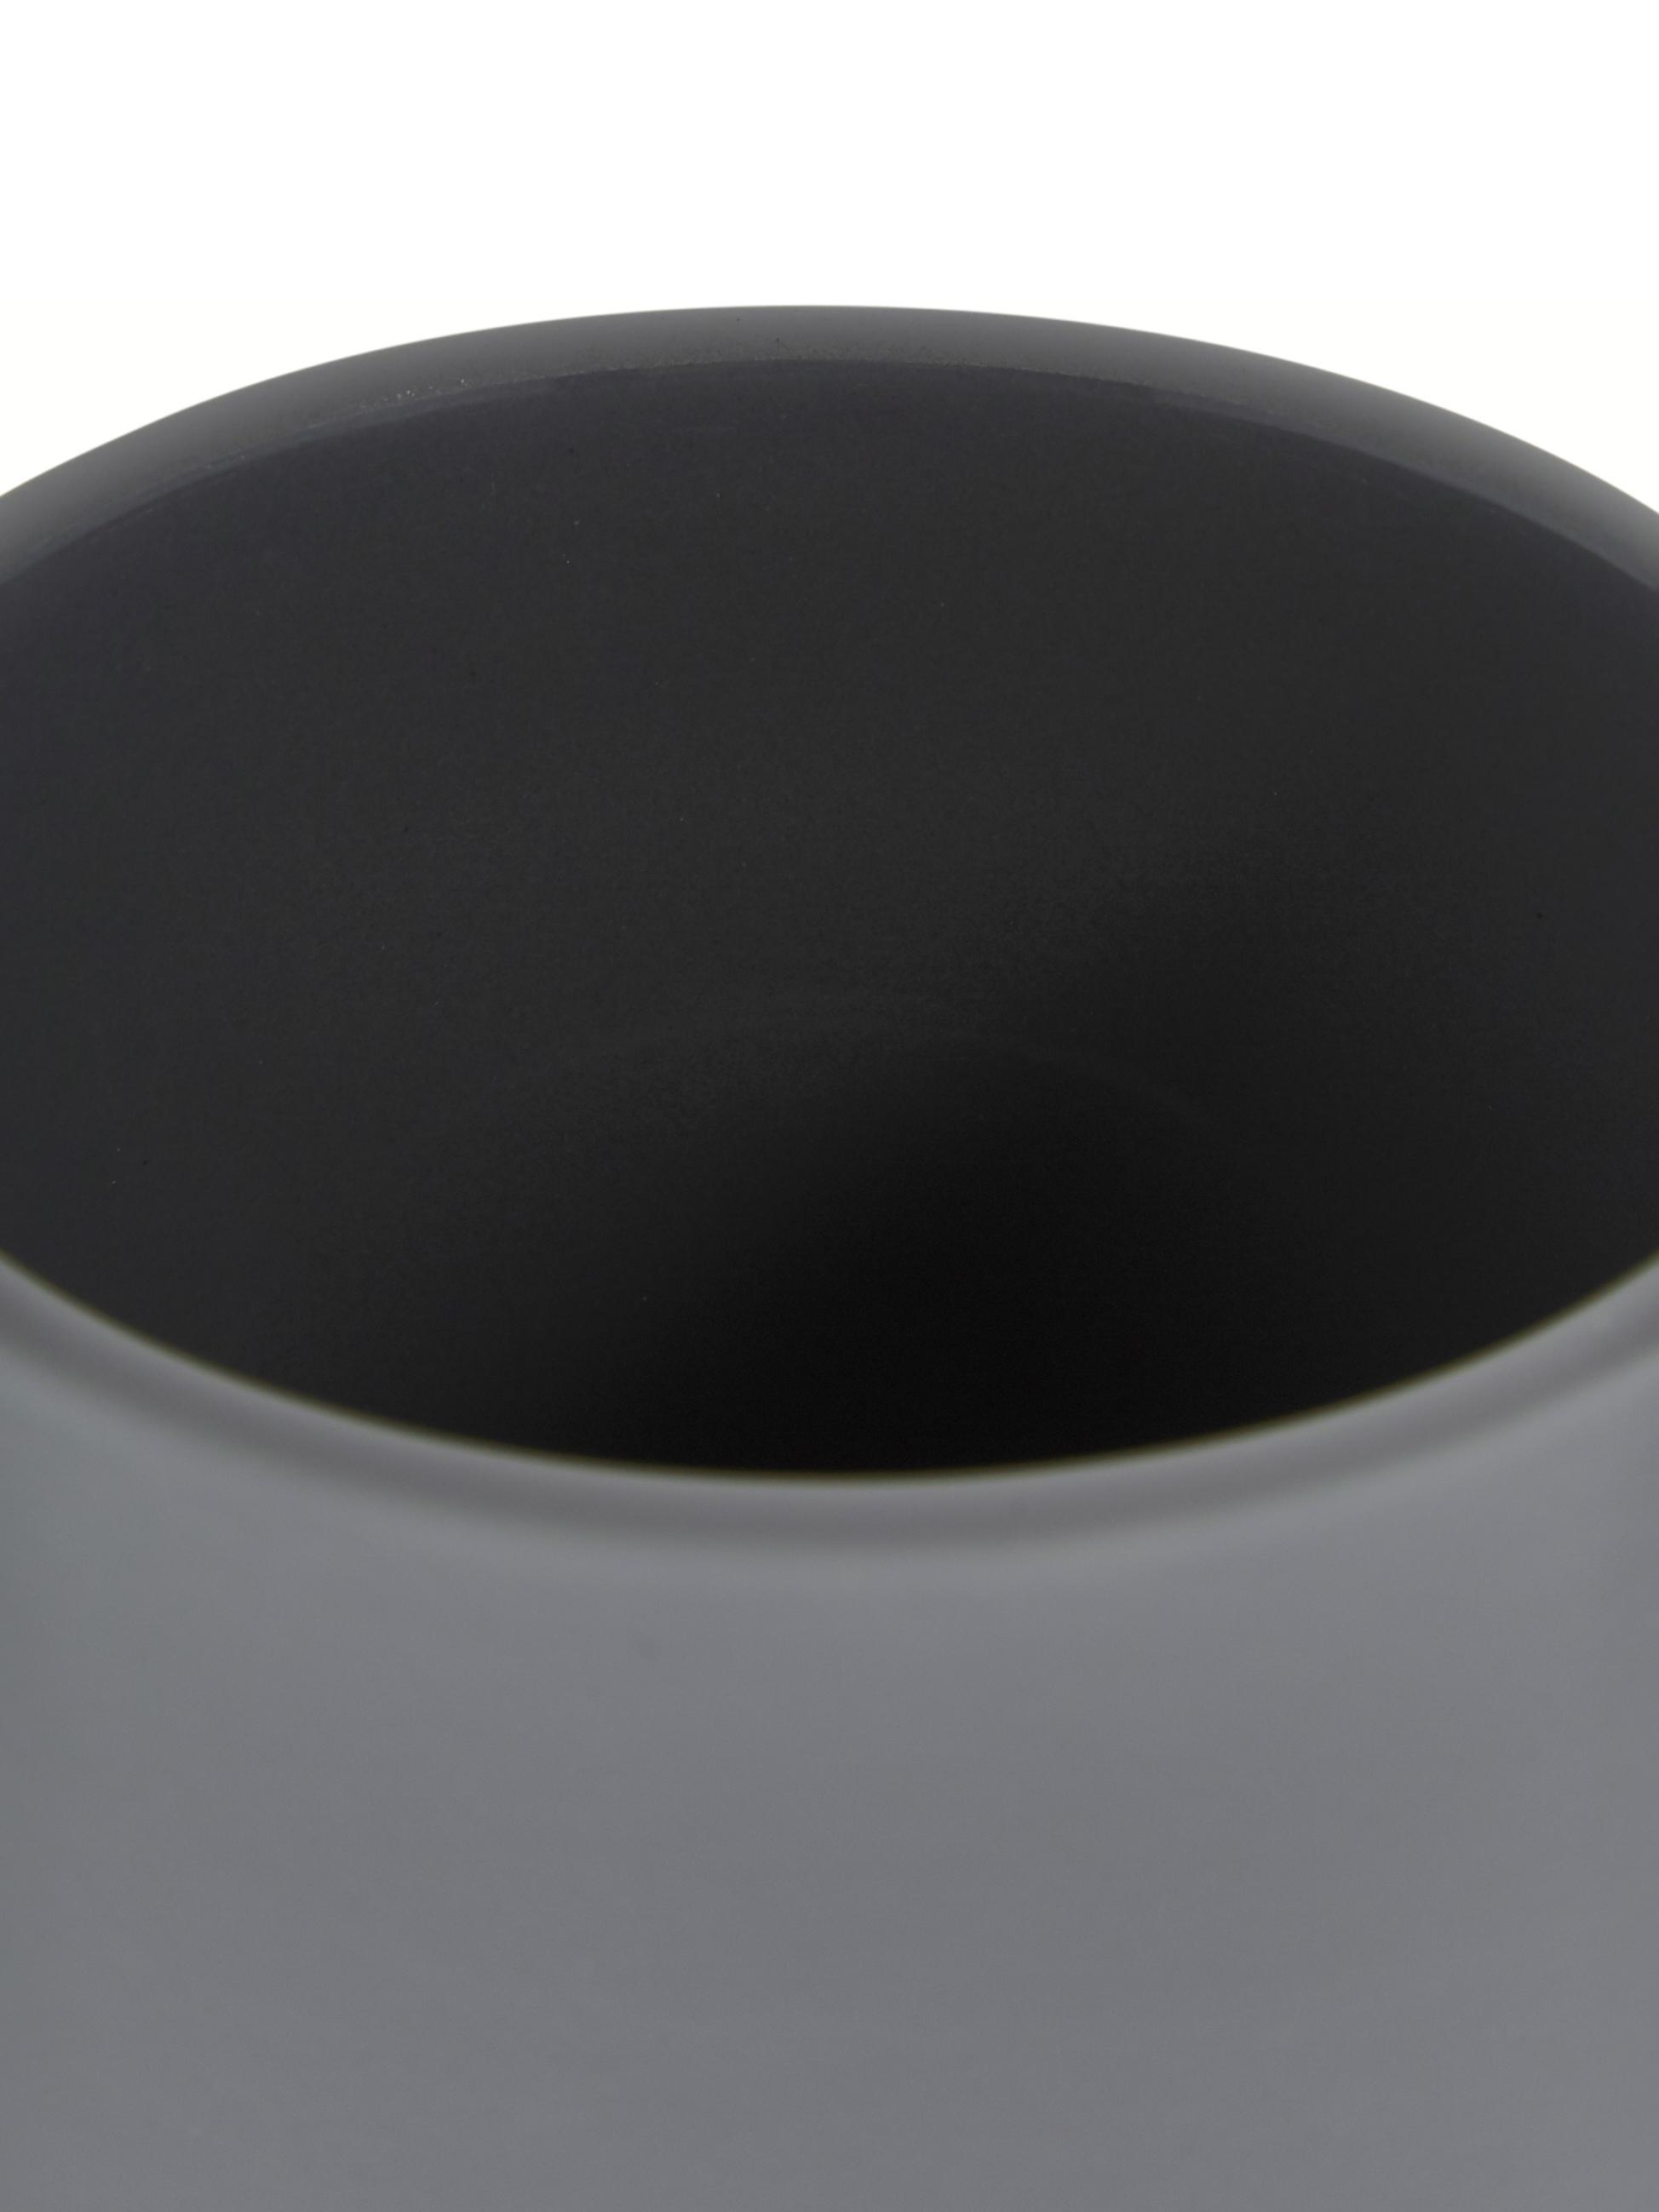 Zeepdispenser Push, Houder: steengoed, Matgrijs, Ø 8 x H 12 cm